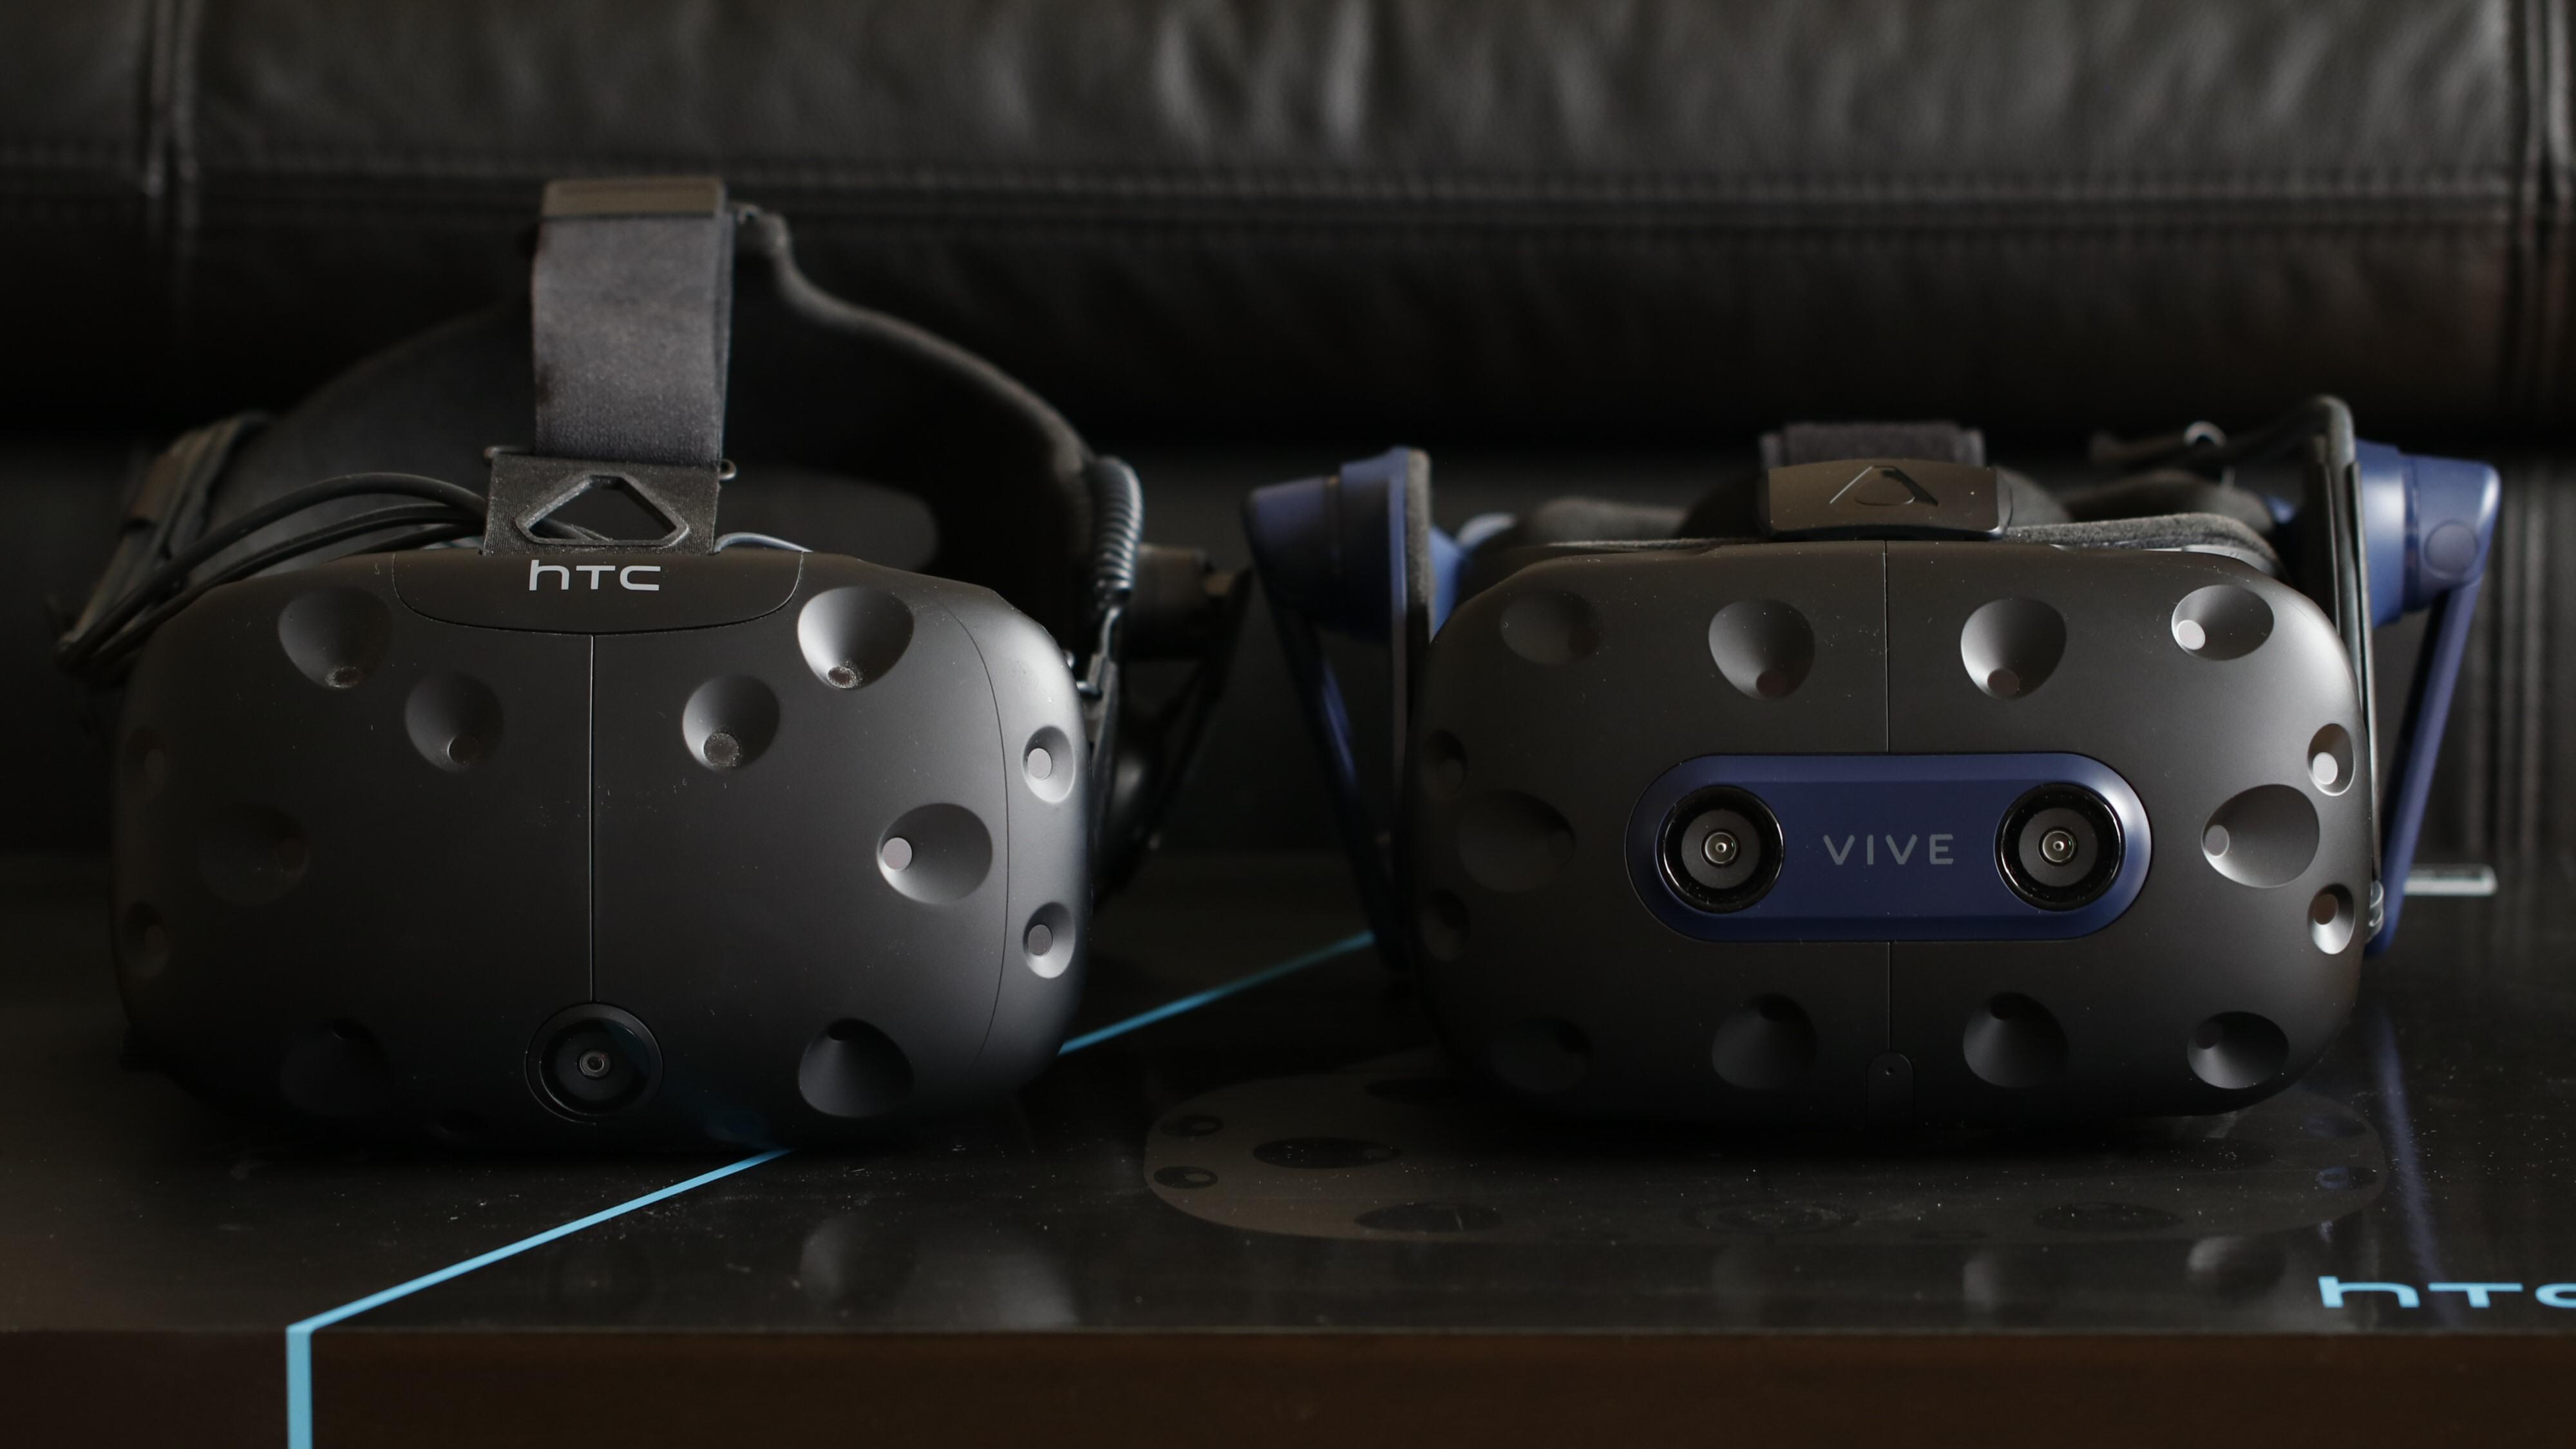 HTC Vive Pro 2 er i første rekke en solid oppgradering for de som sitter på den originale Viven (her med Deluxe Audio Strap).